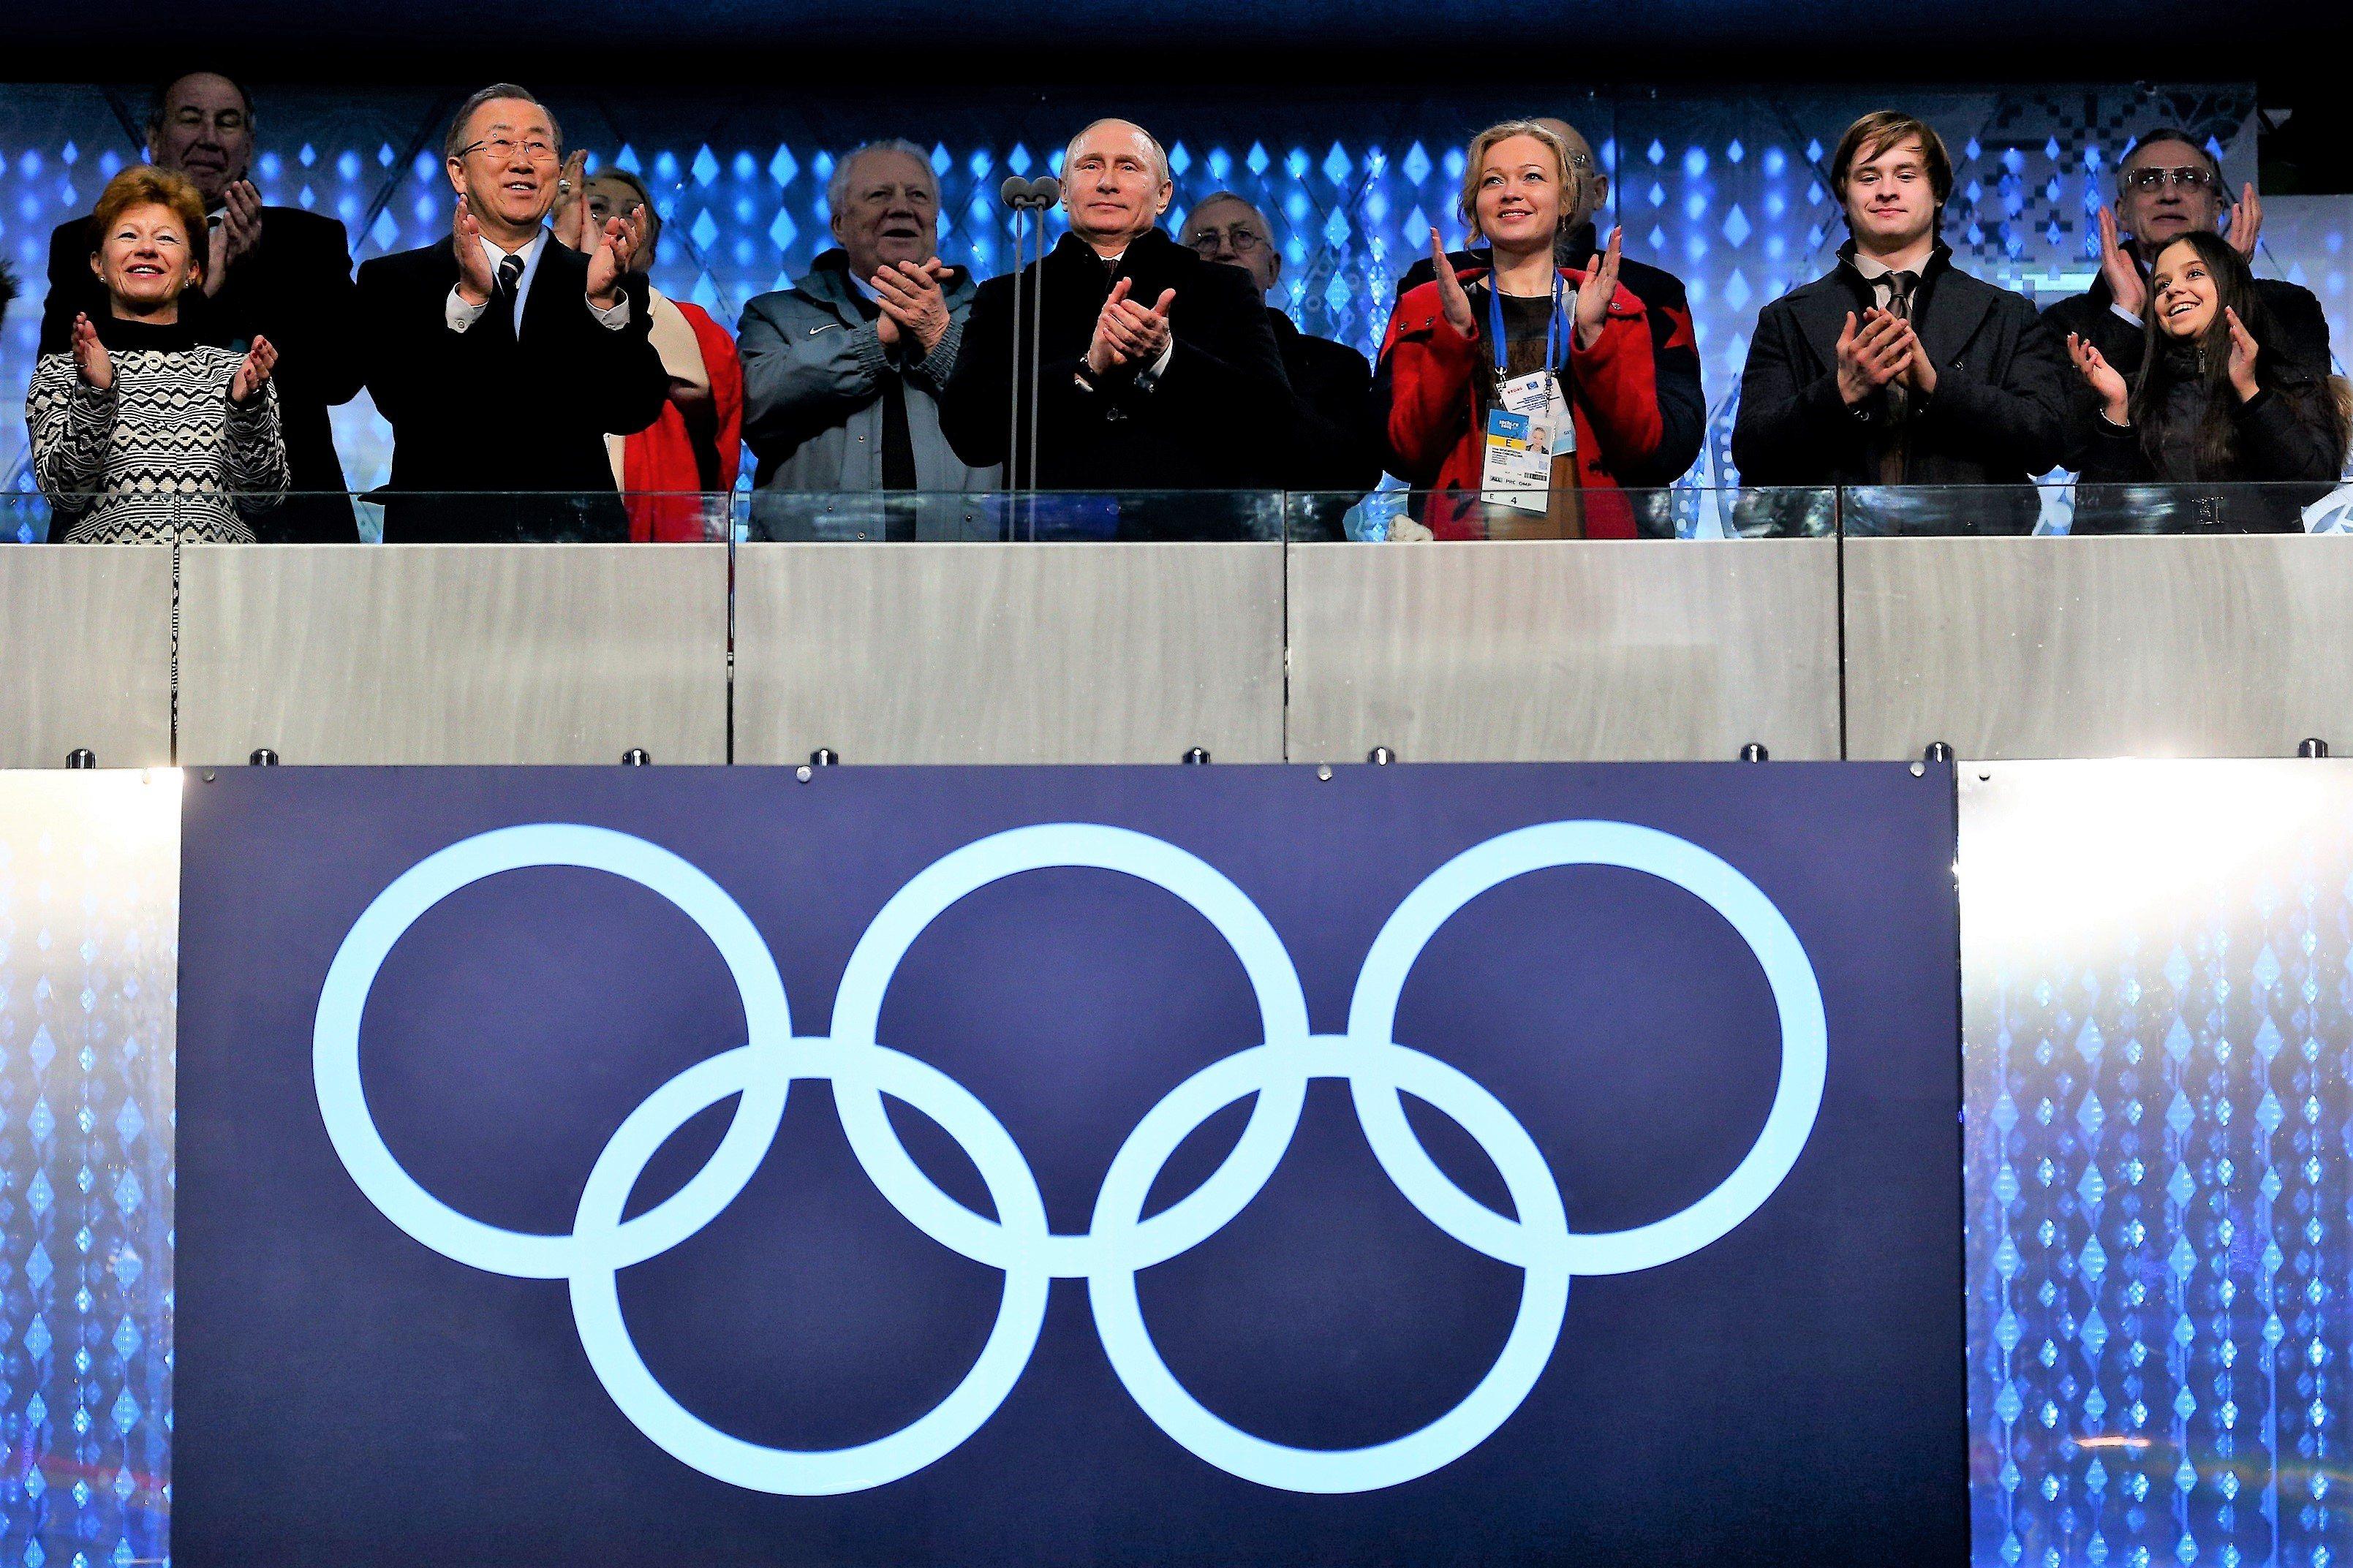 2014 Winter Olympic Games - Sochi, Russia